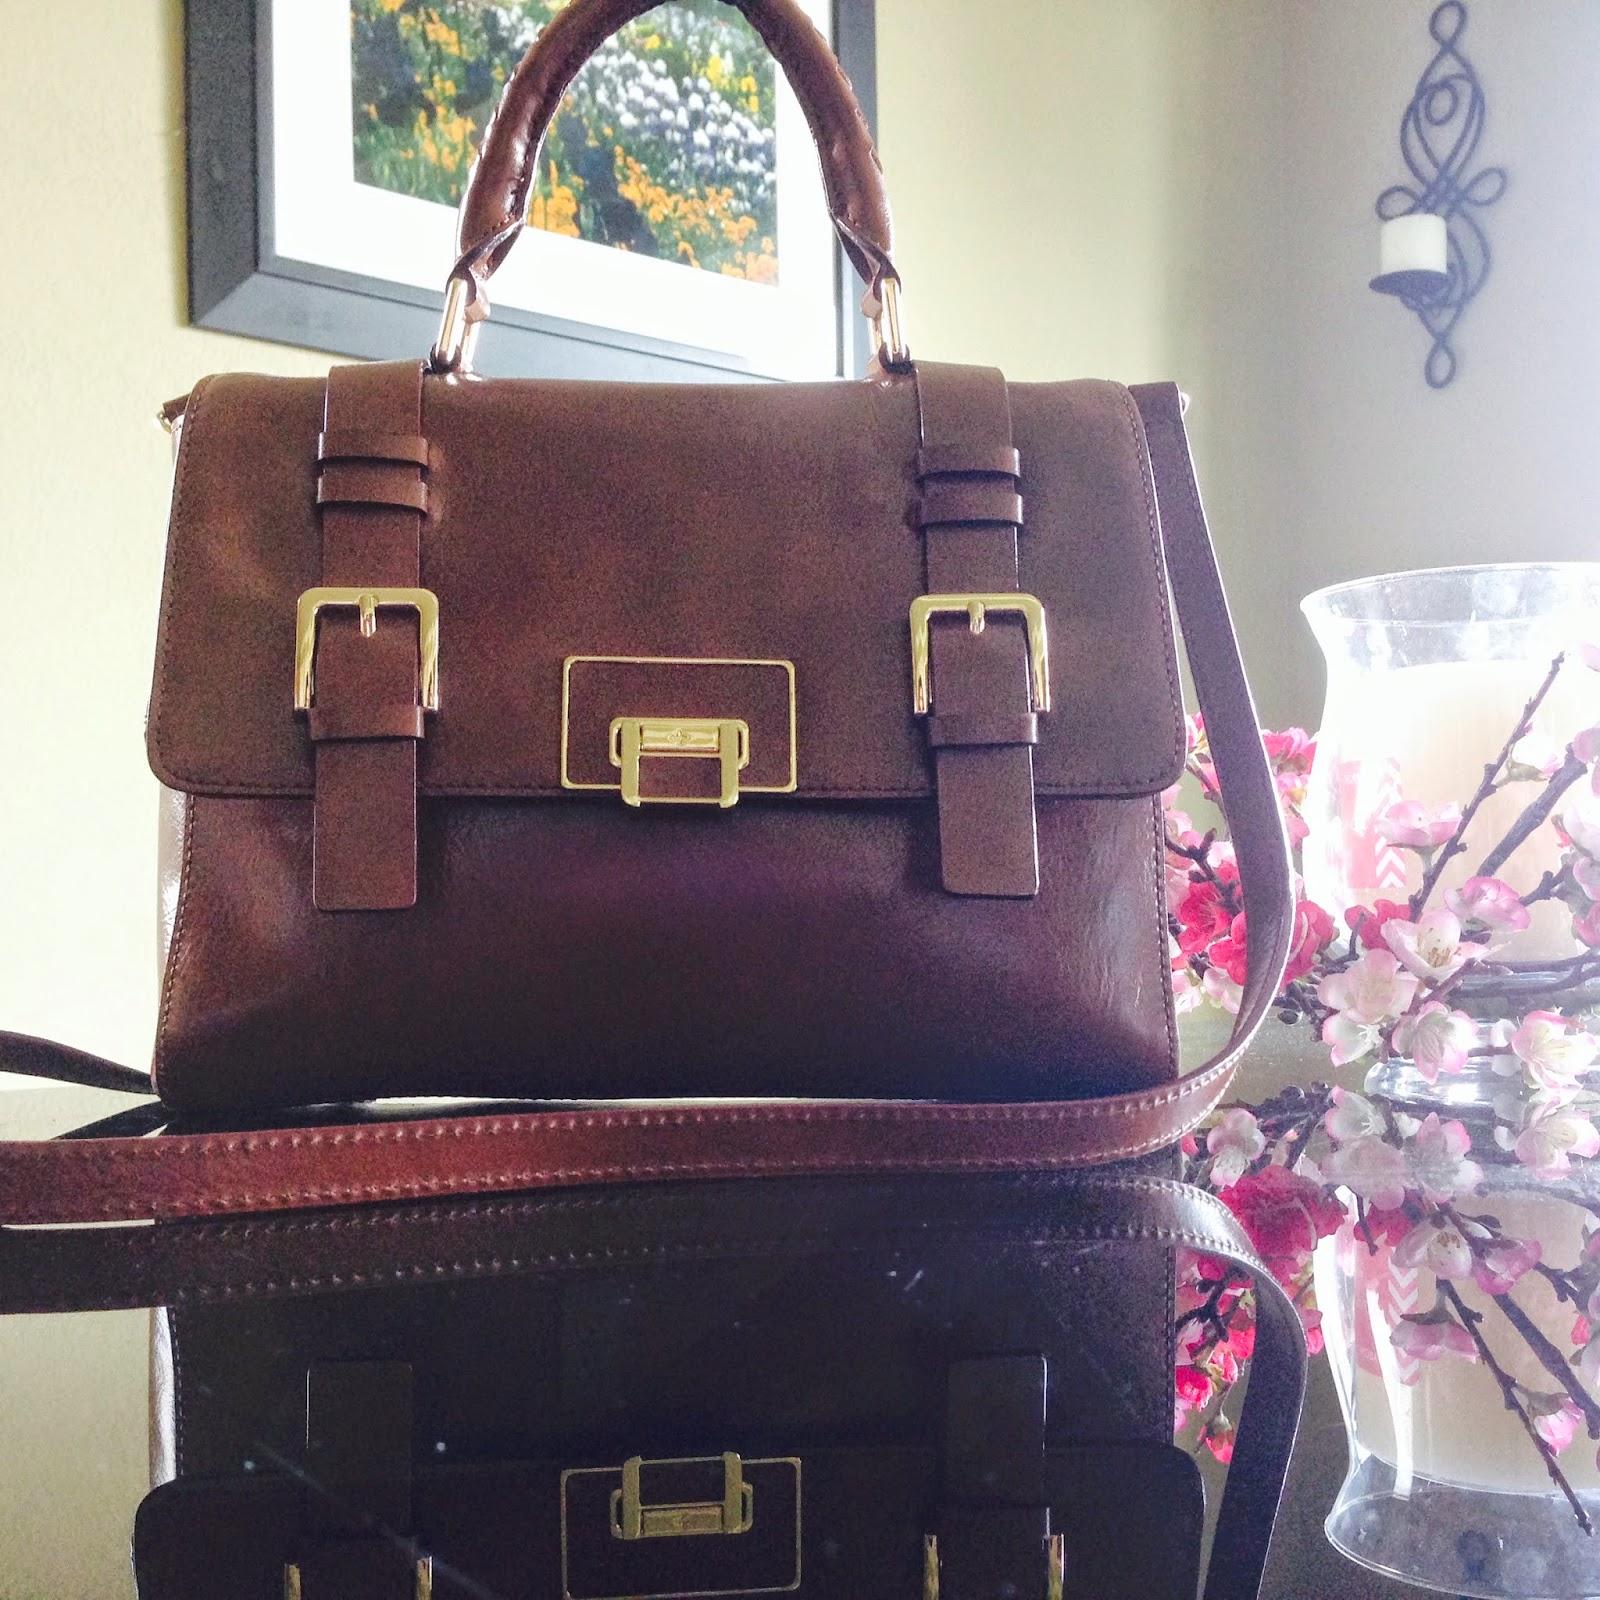 b0f8e3357638 What s in my purse  Antonio Melani Wenda Cross-Body Bag Review ...